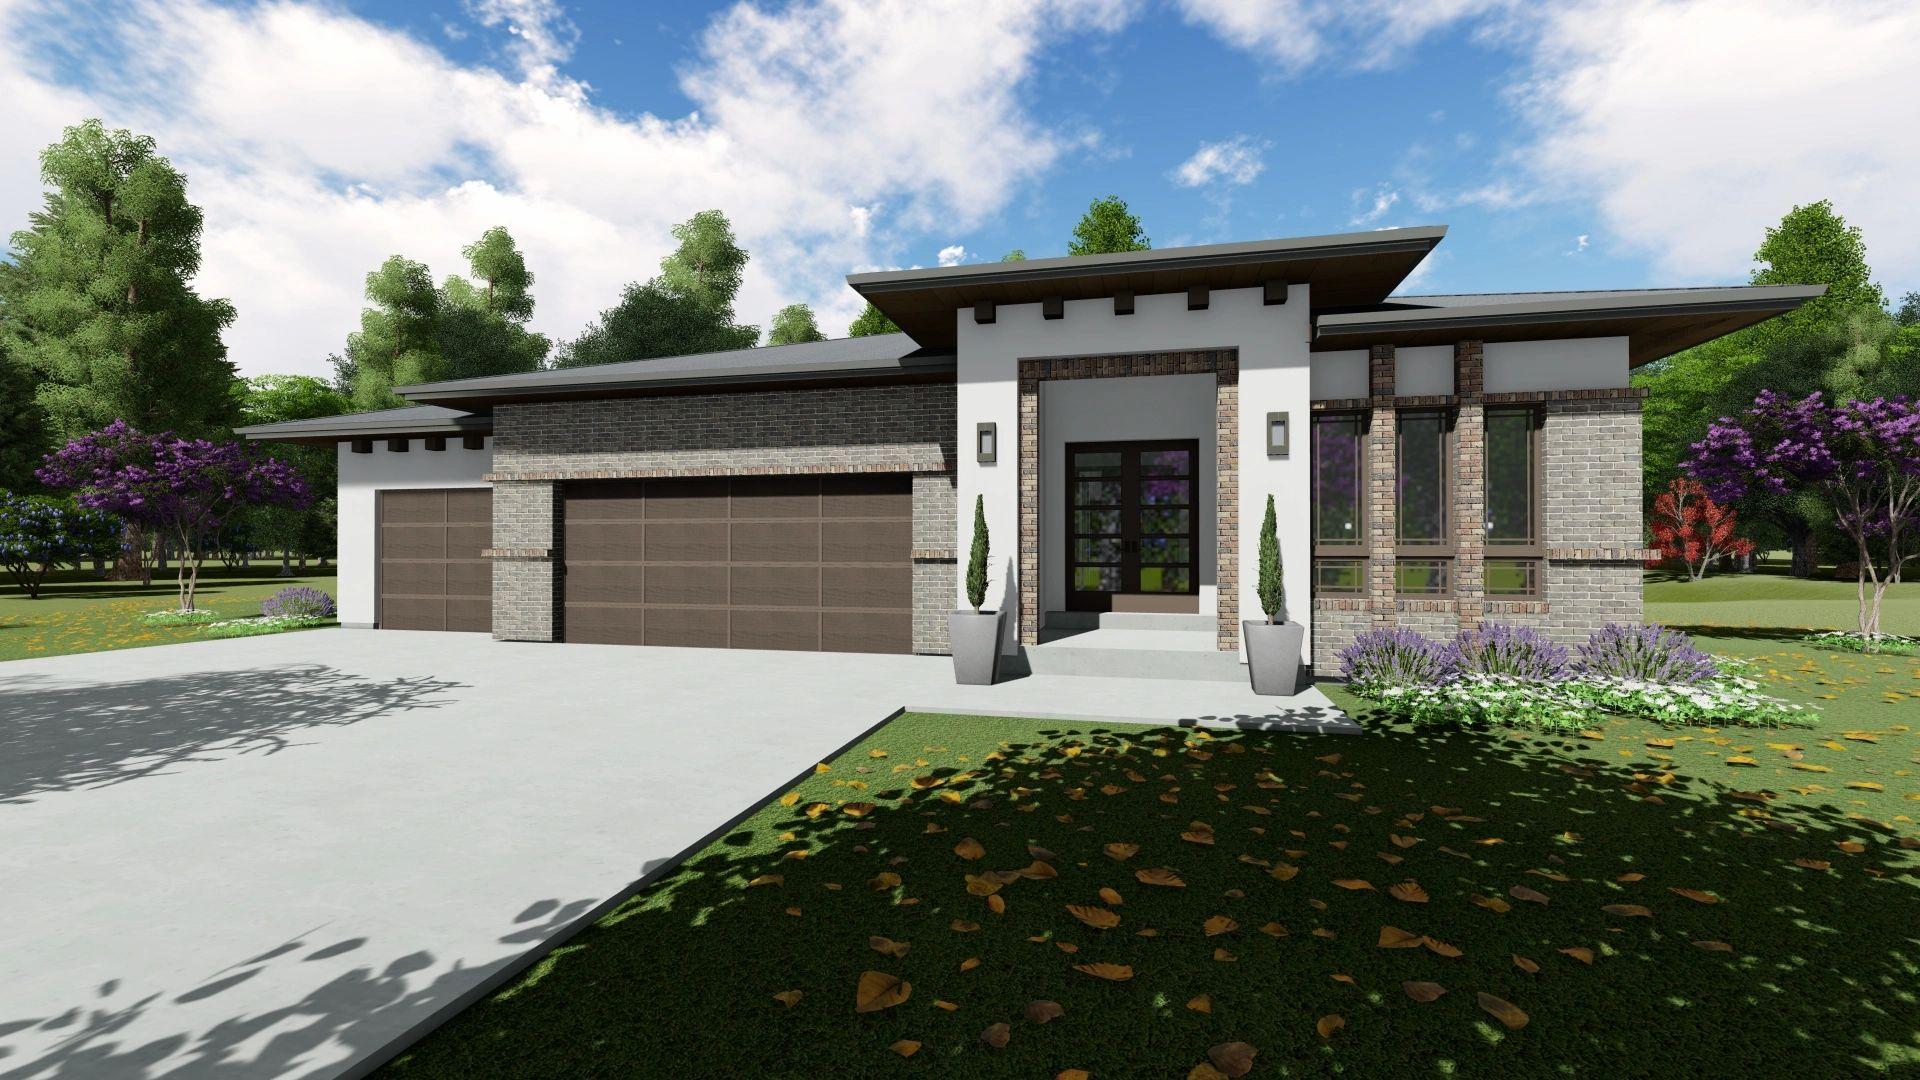 USAHOMEPLANS - Home Plans, Home Plans, House Plans, Floor Plans ...